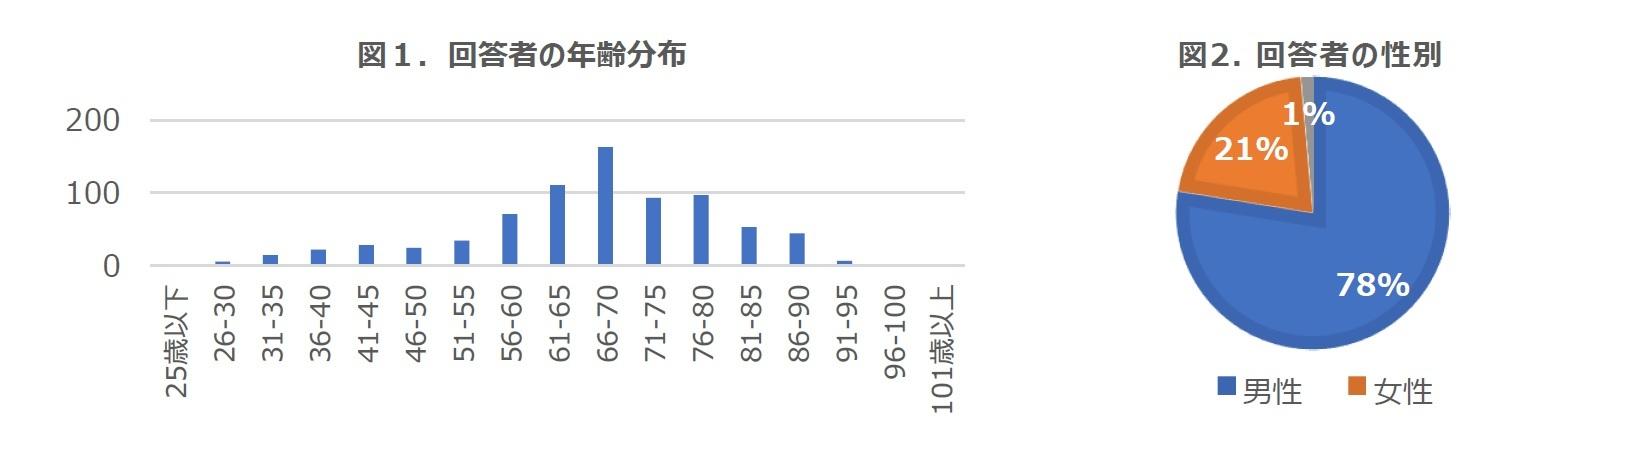 図1.回答者の年齢分布/図2. 回答者の性別